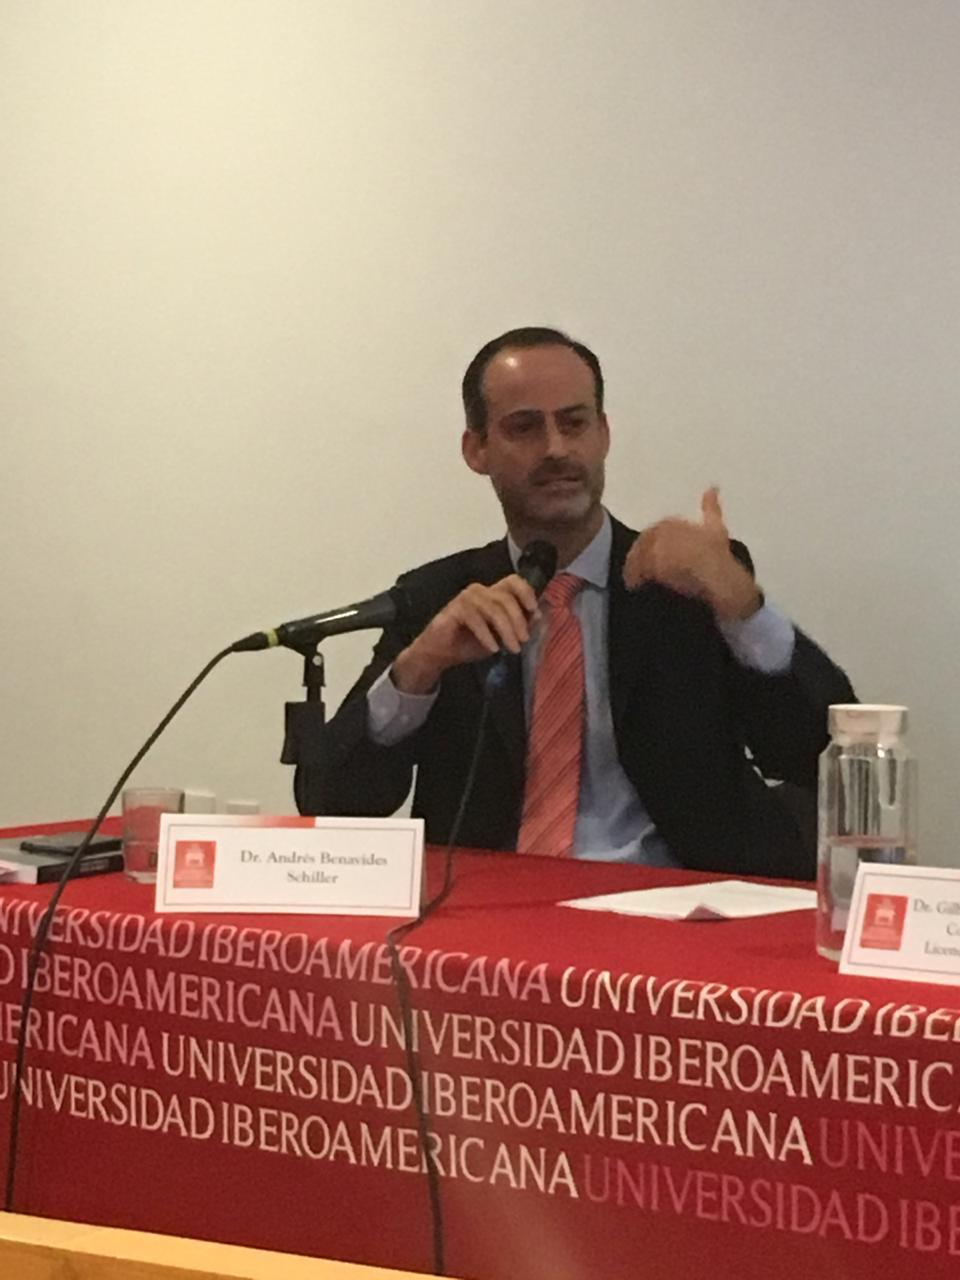 conferencia U. Iberoamericana foto 2